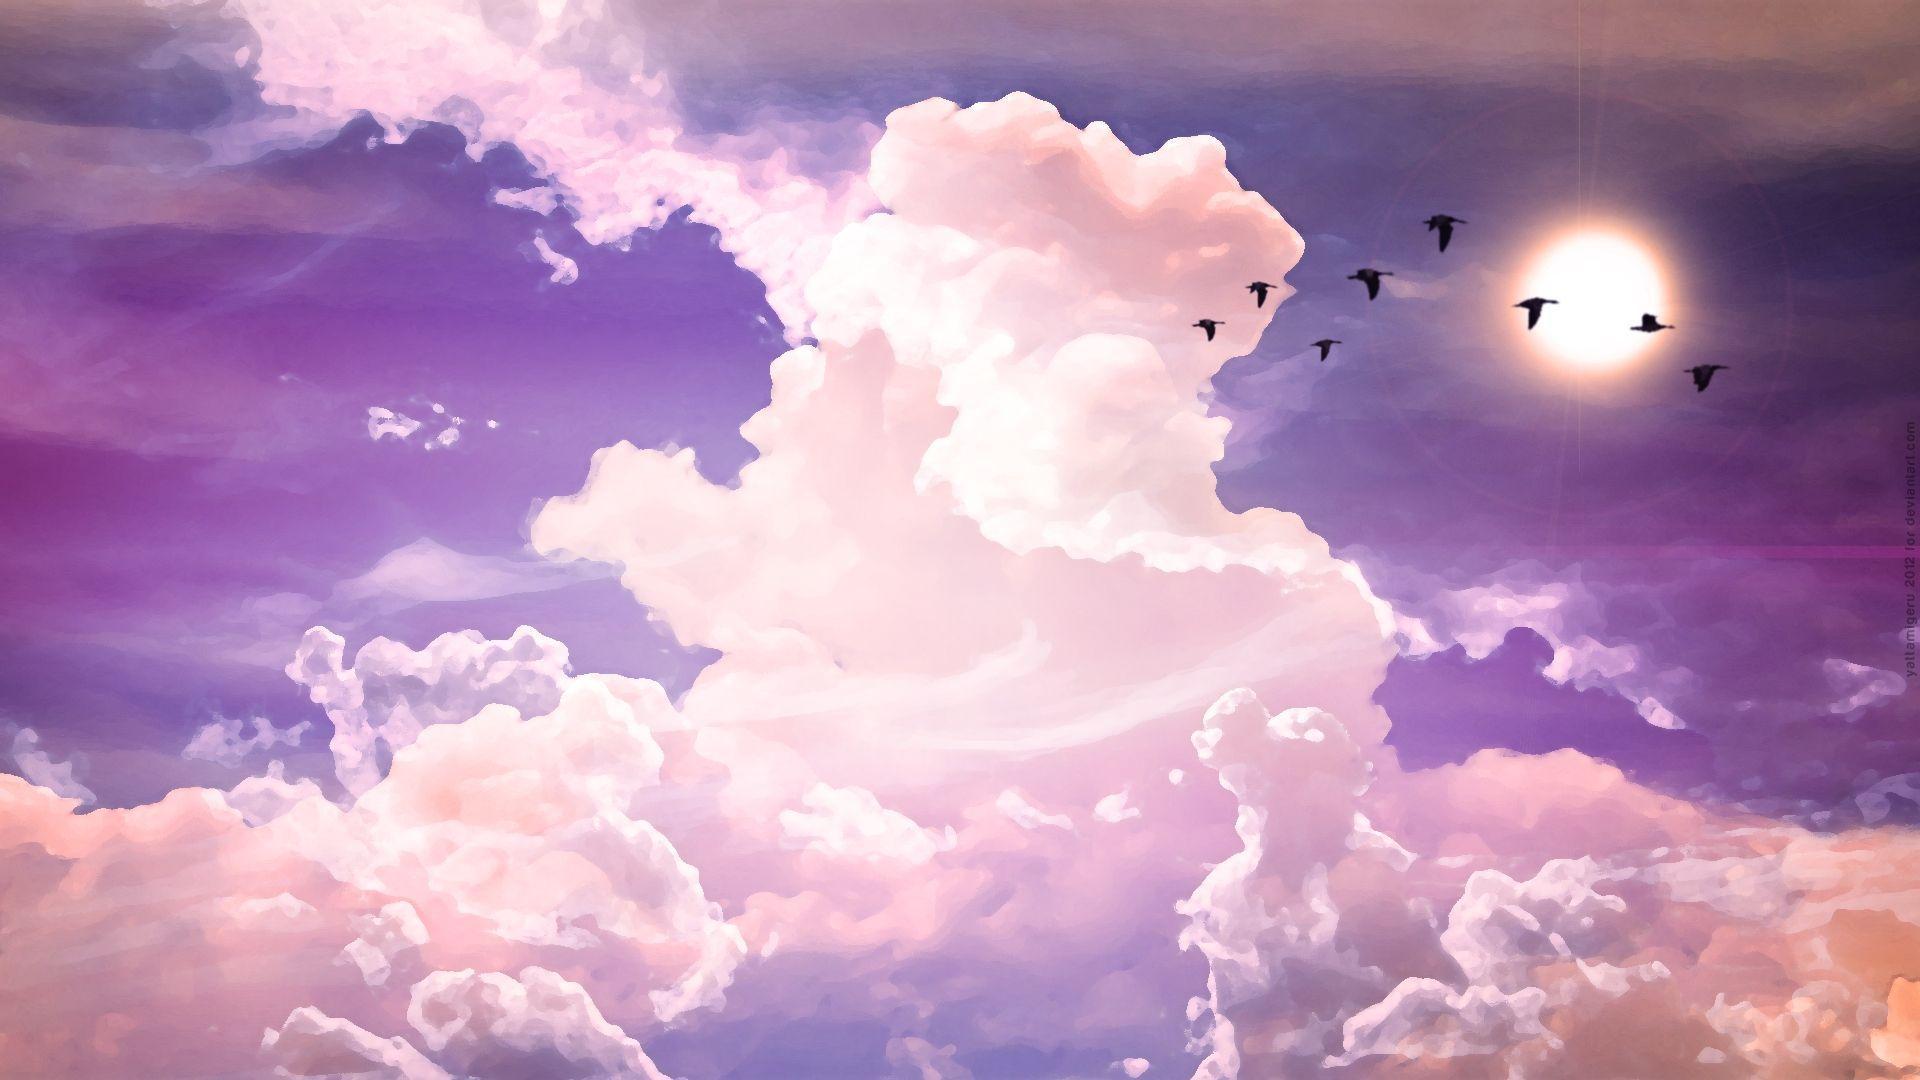 Aesthetic Sky Desktop Wallpapers Top Free Aesthetic Sky Desktop Backgrounds Wallpaperaccess